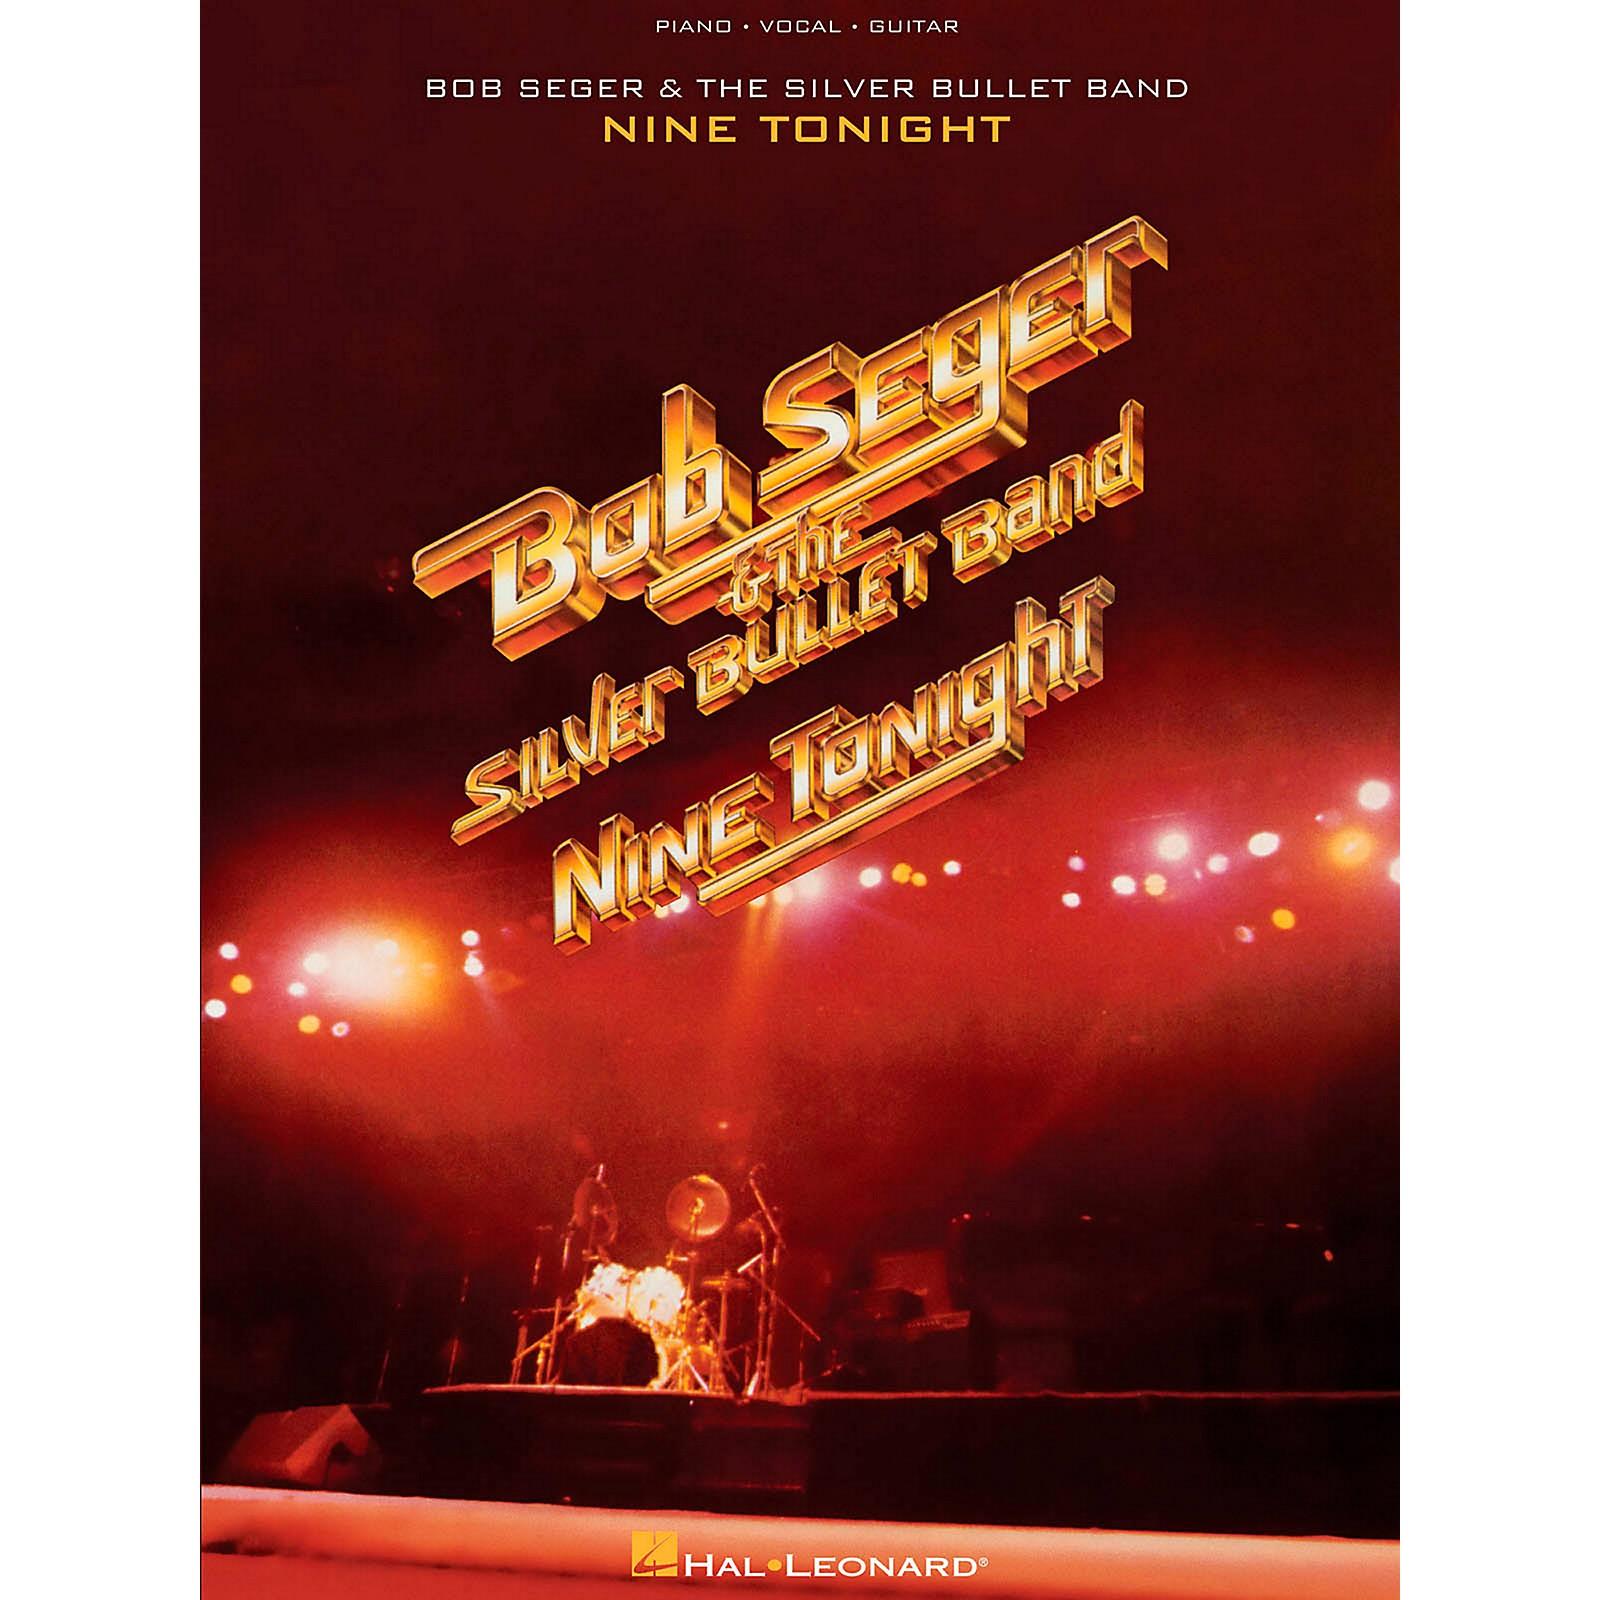 Hal Leonard Bob Seger & The Silver Bullet Band - Nine Tonight For Piano/Vocal/Guitar